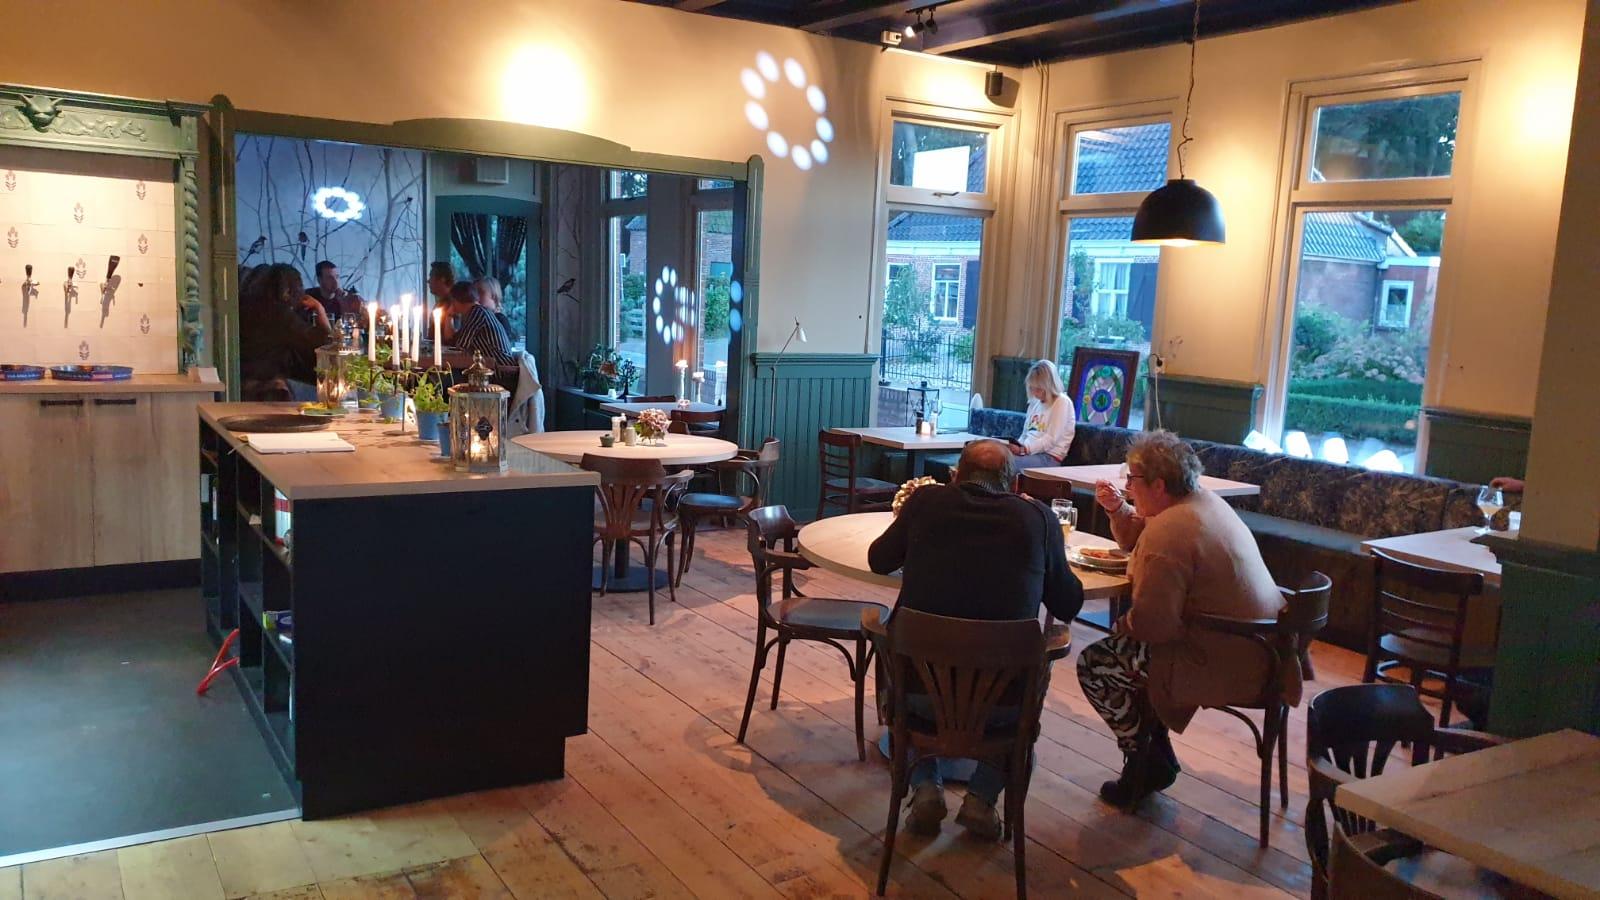 herberg-foestrum-restaurant-catering (8)